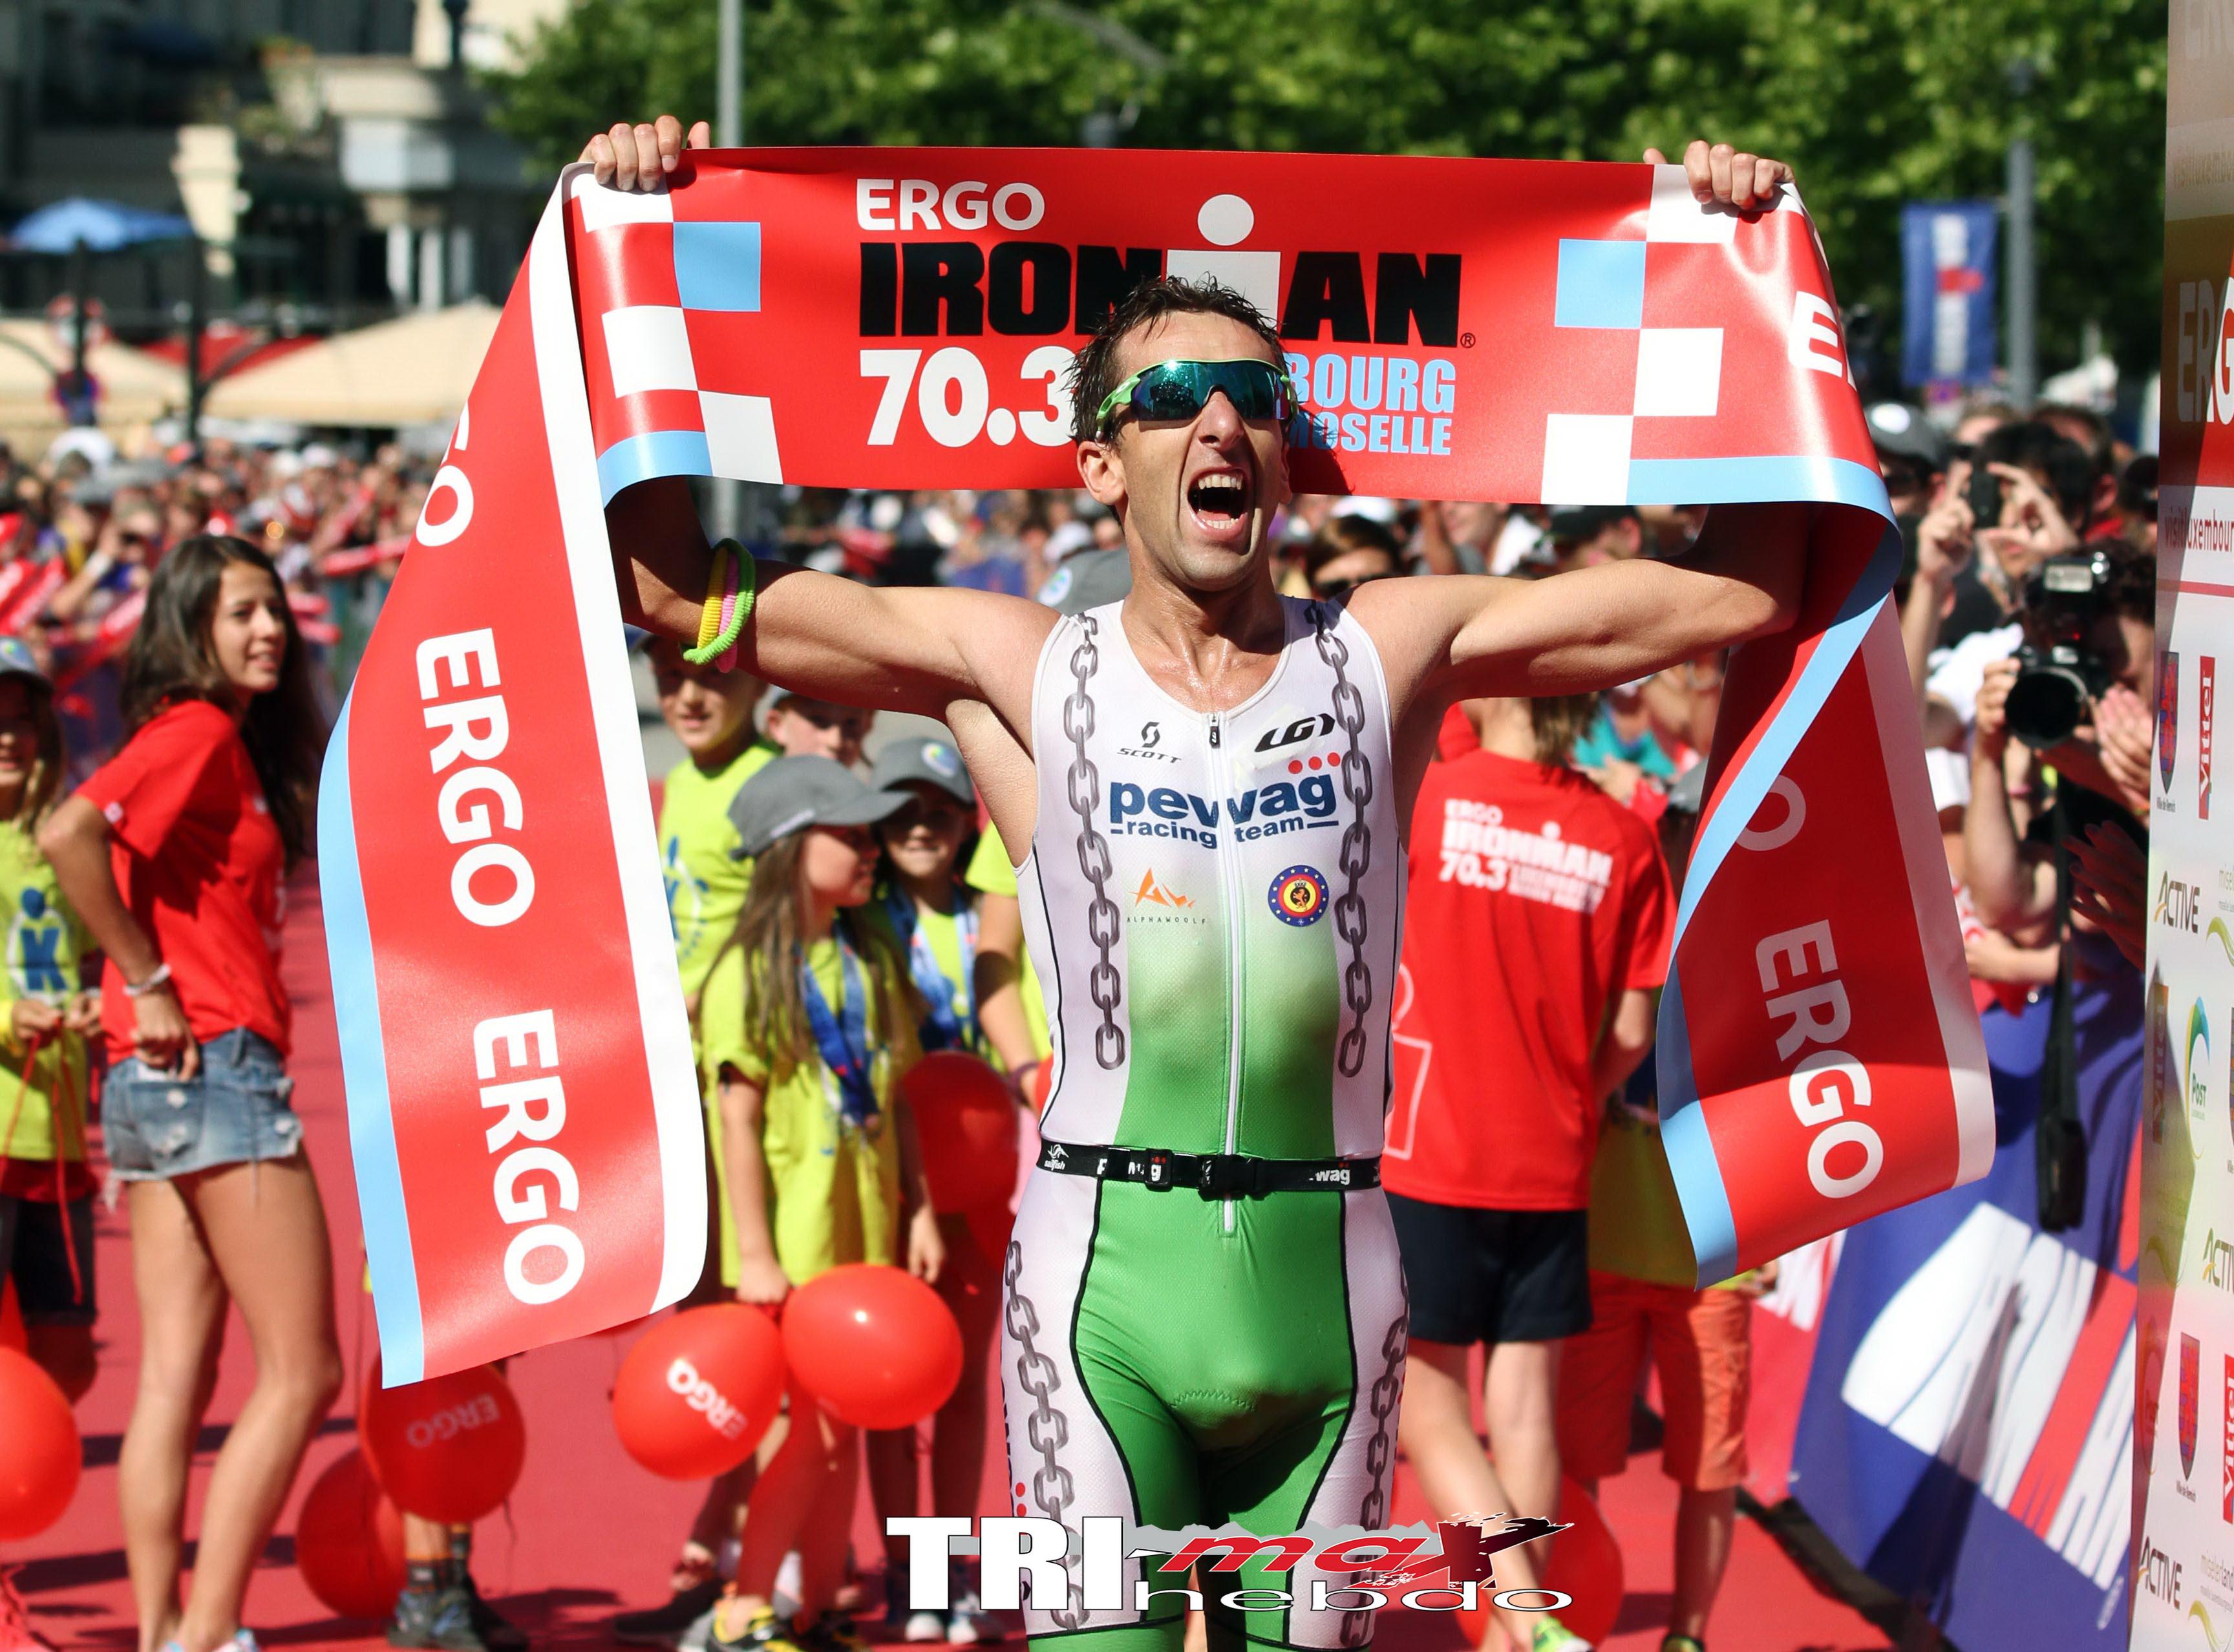 70.3 Luxembourg : Vanhoenacker renoue avec la victoire, Romain Guillaume 5e